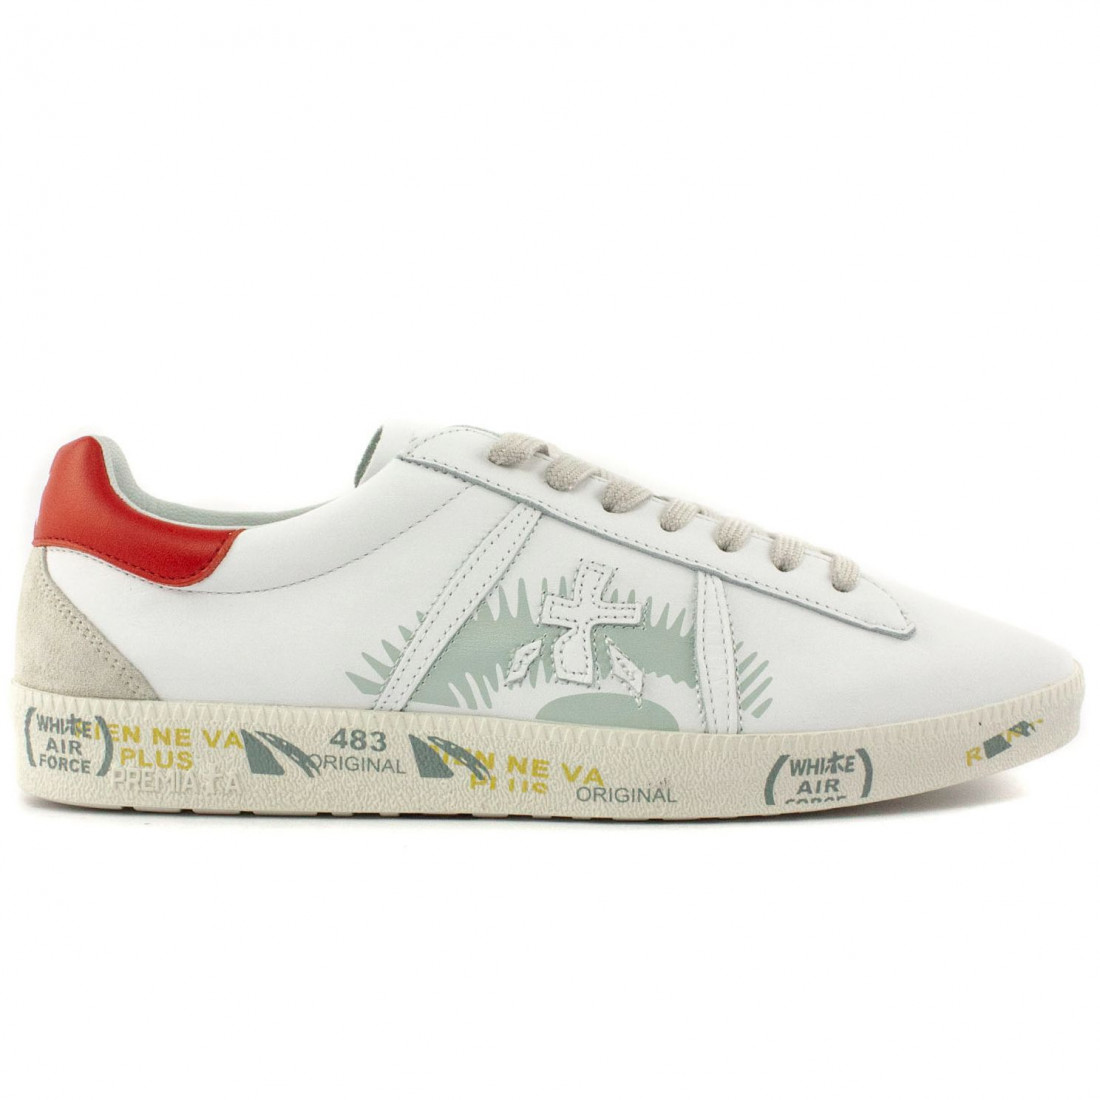 sneakers damen premiata andy d5144 8196